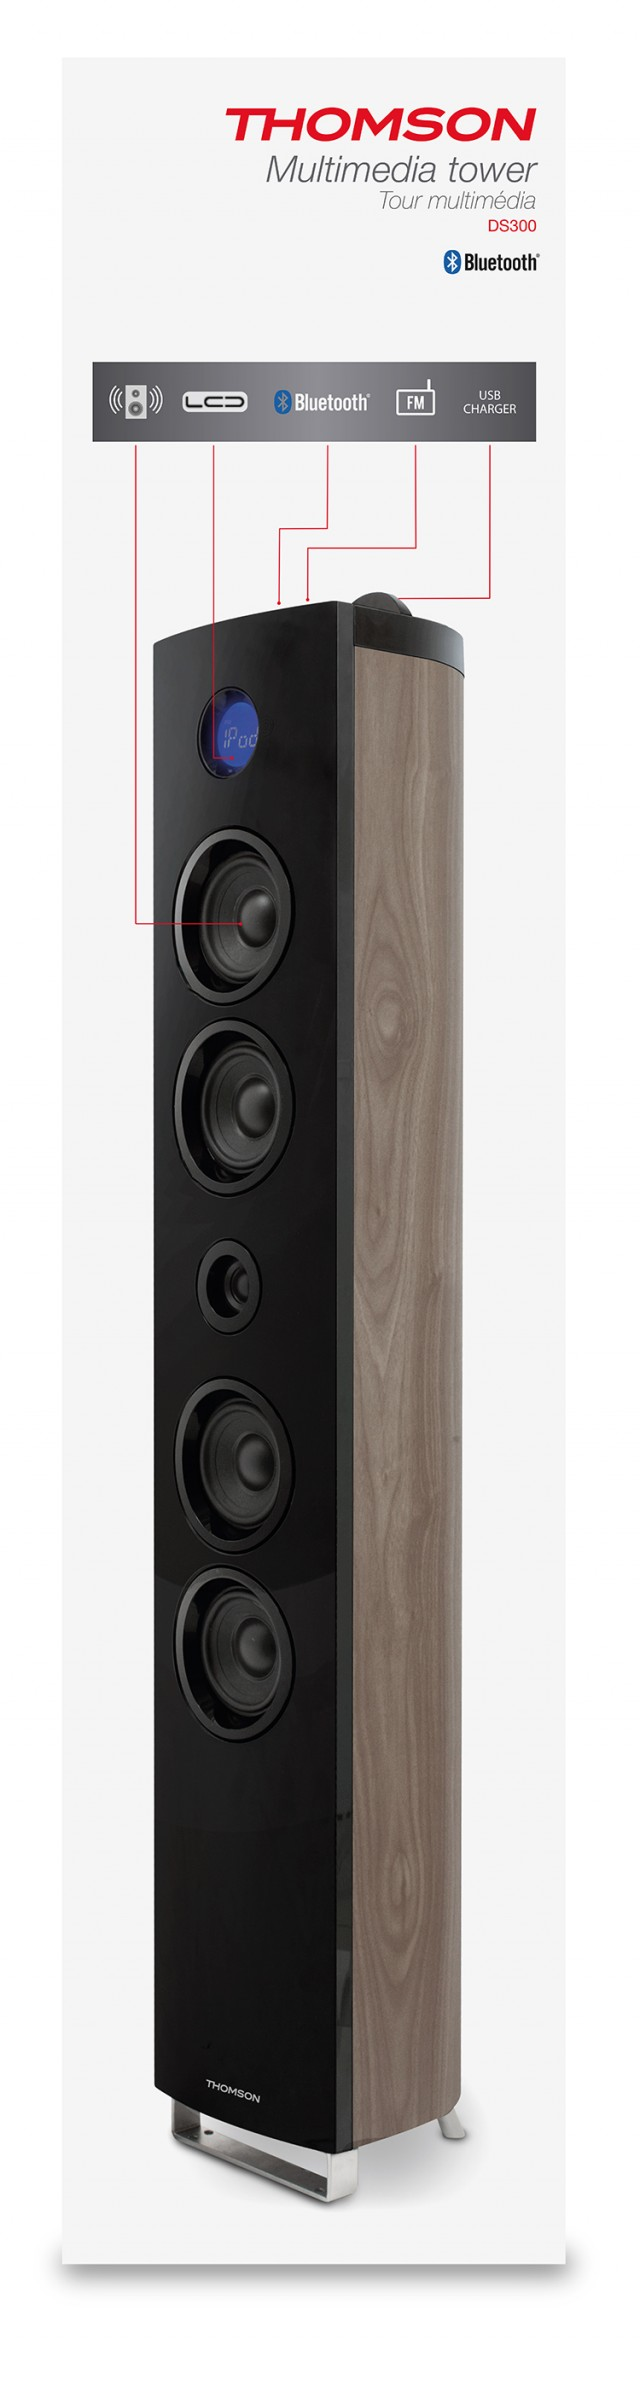 Thomson Sound Tower DS300 - Packshot